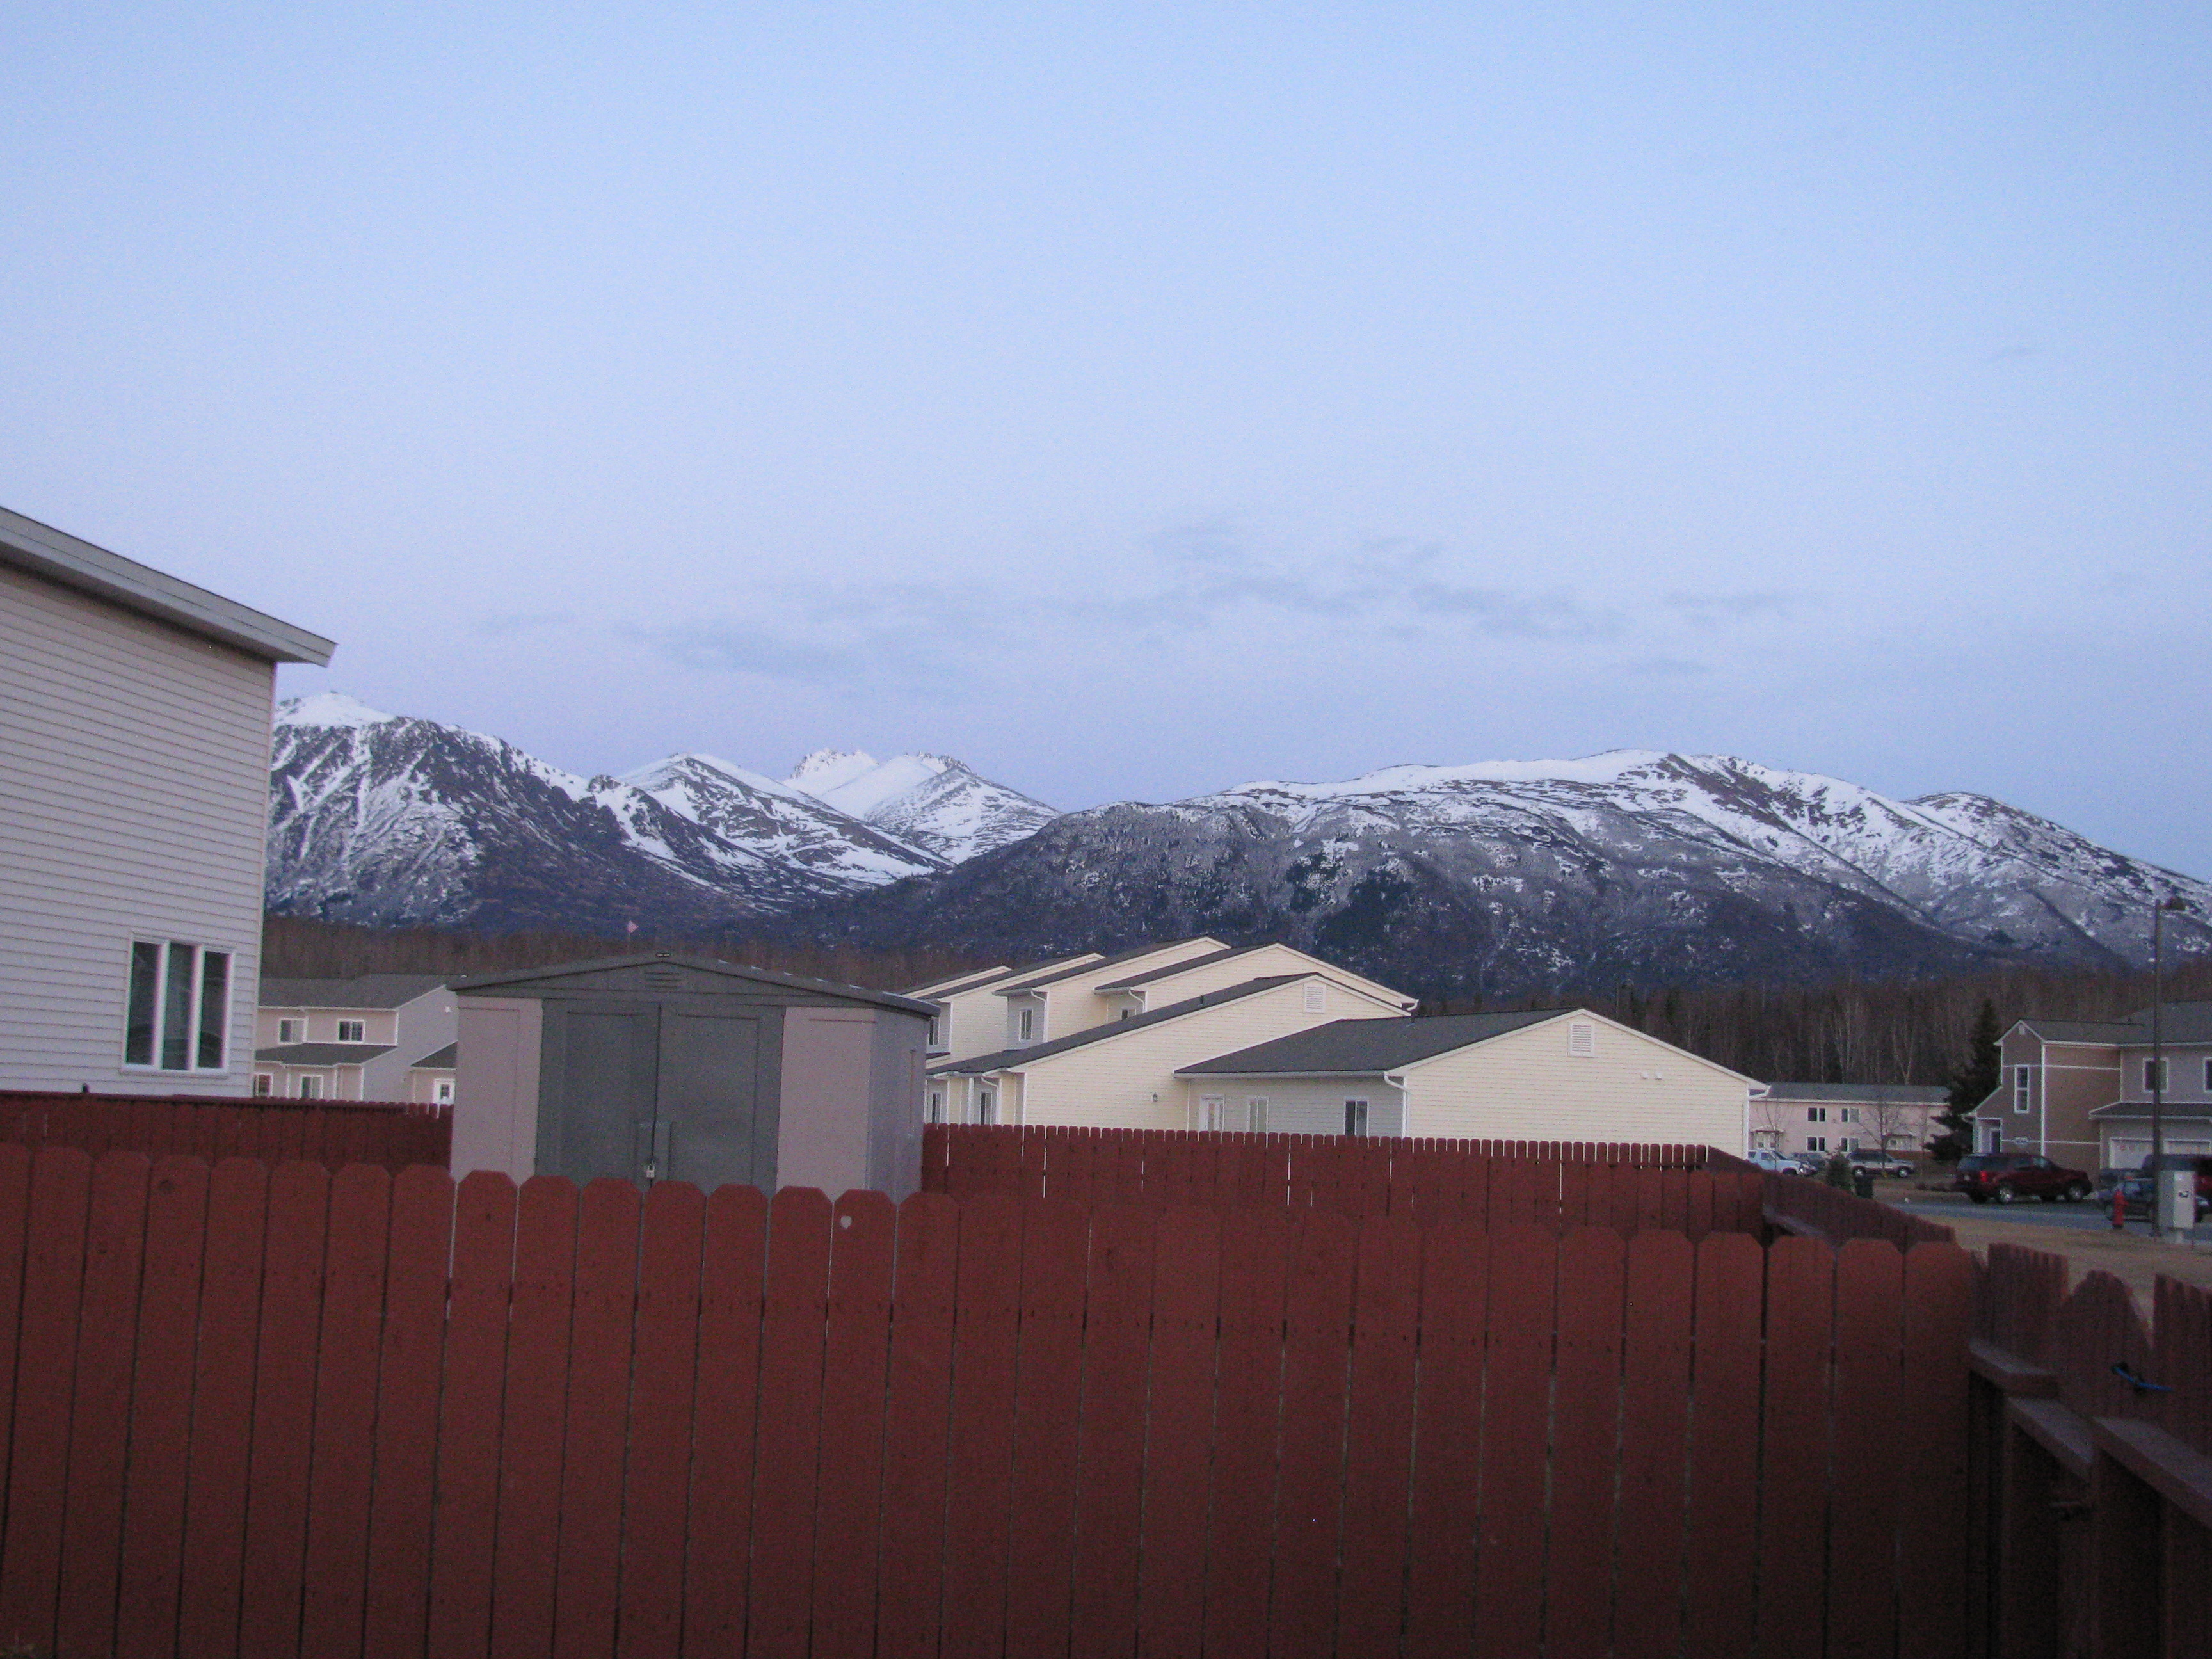 Name: Alaska_May2011_002.jpg, Views: 19, Size: 2.37 MB